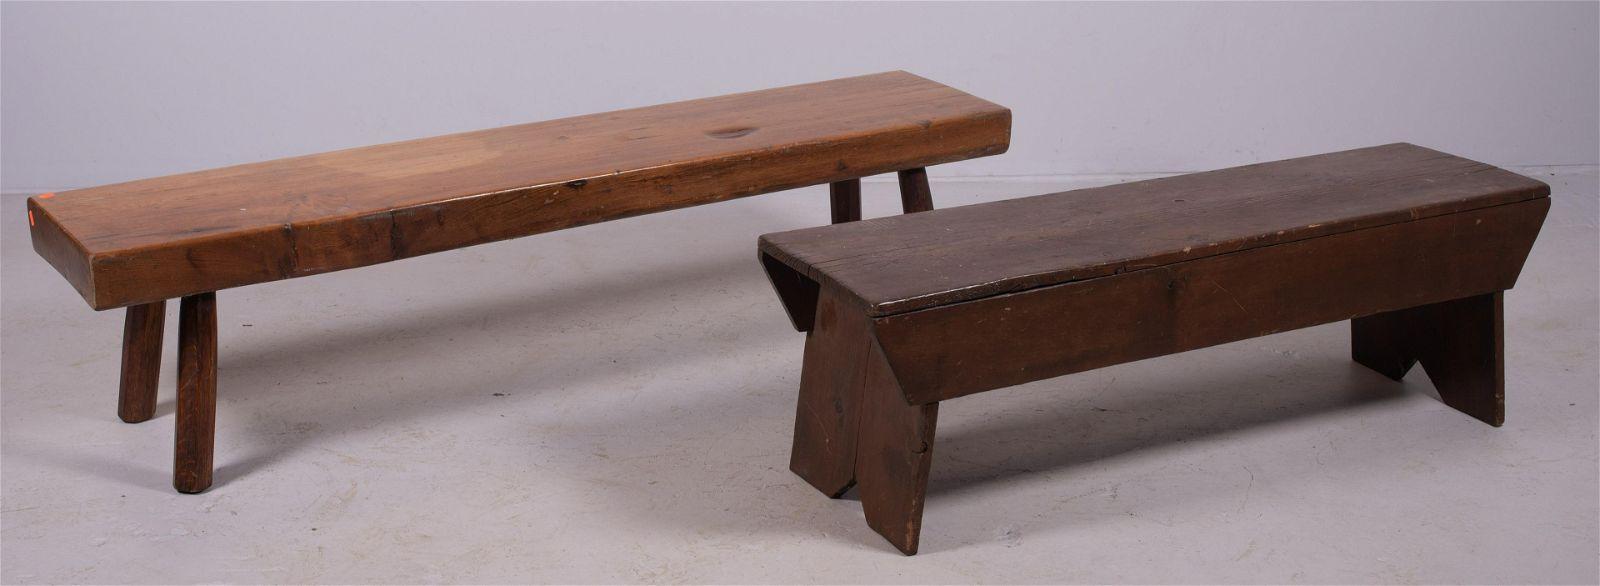 (2) Primitive benches